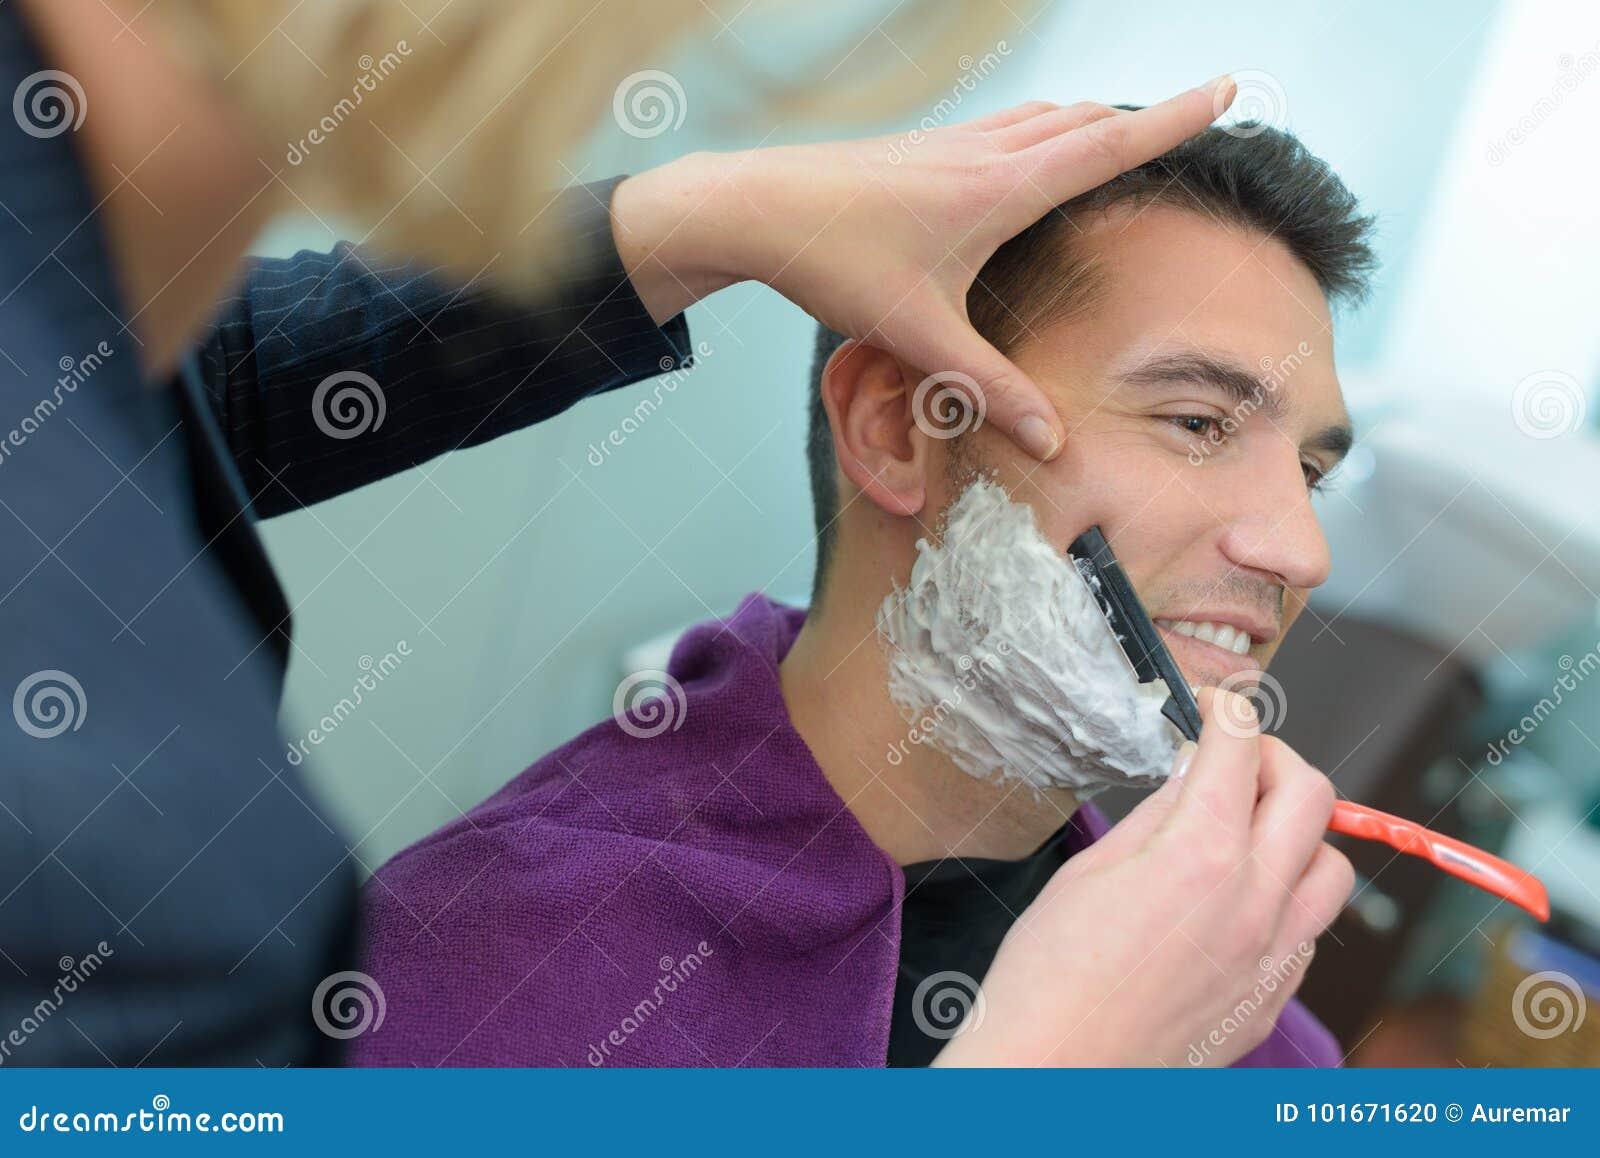 Man barber shaves customers beard